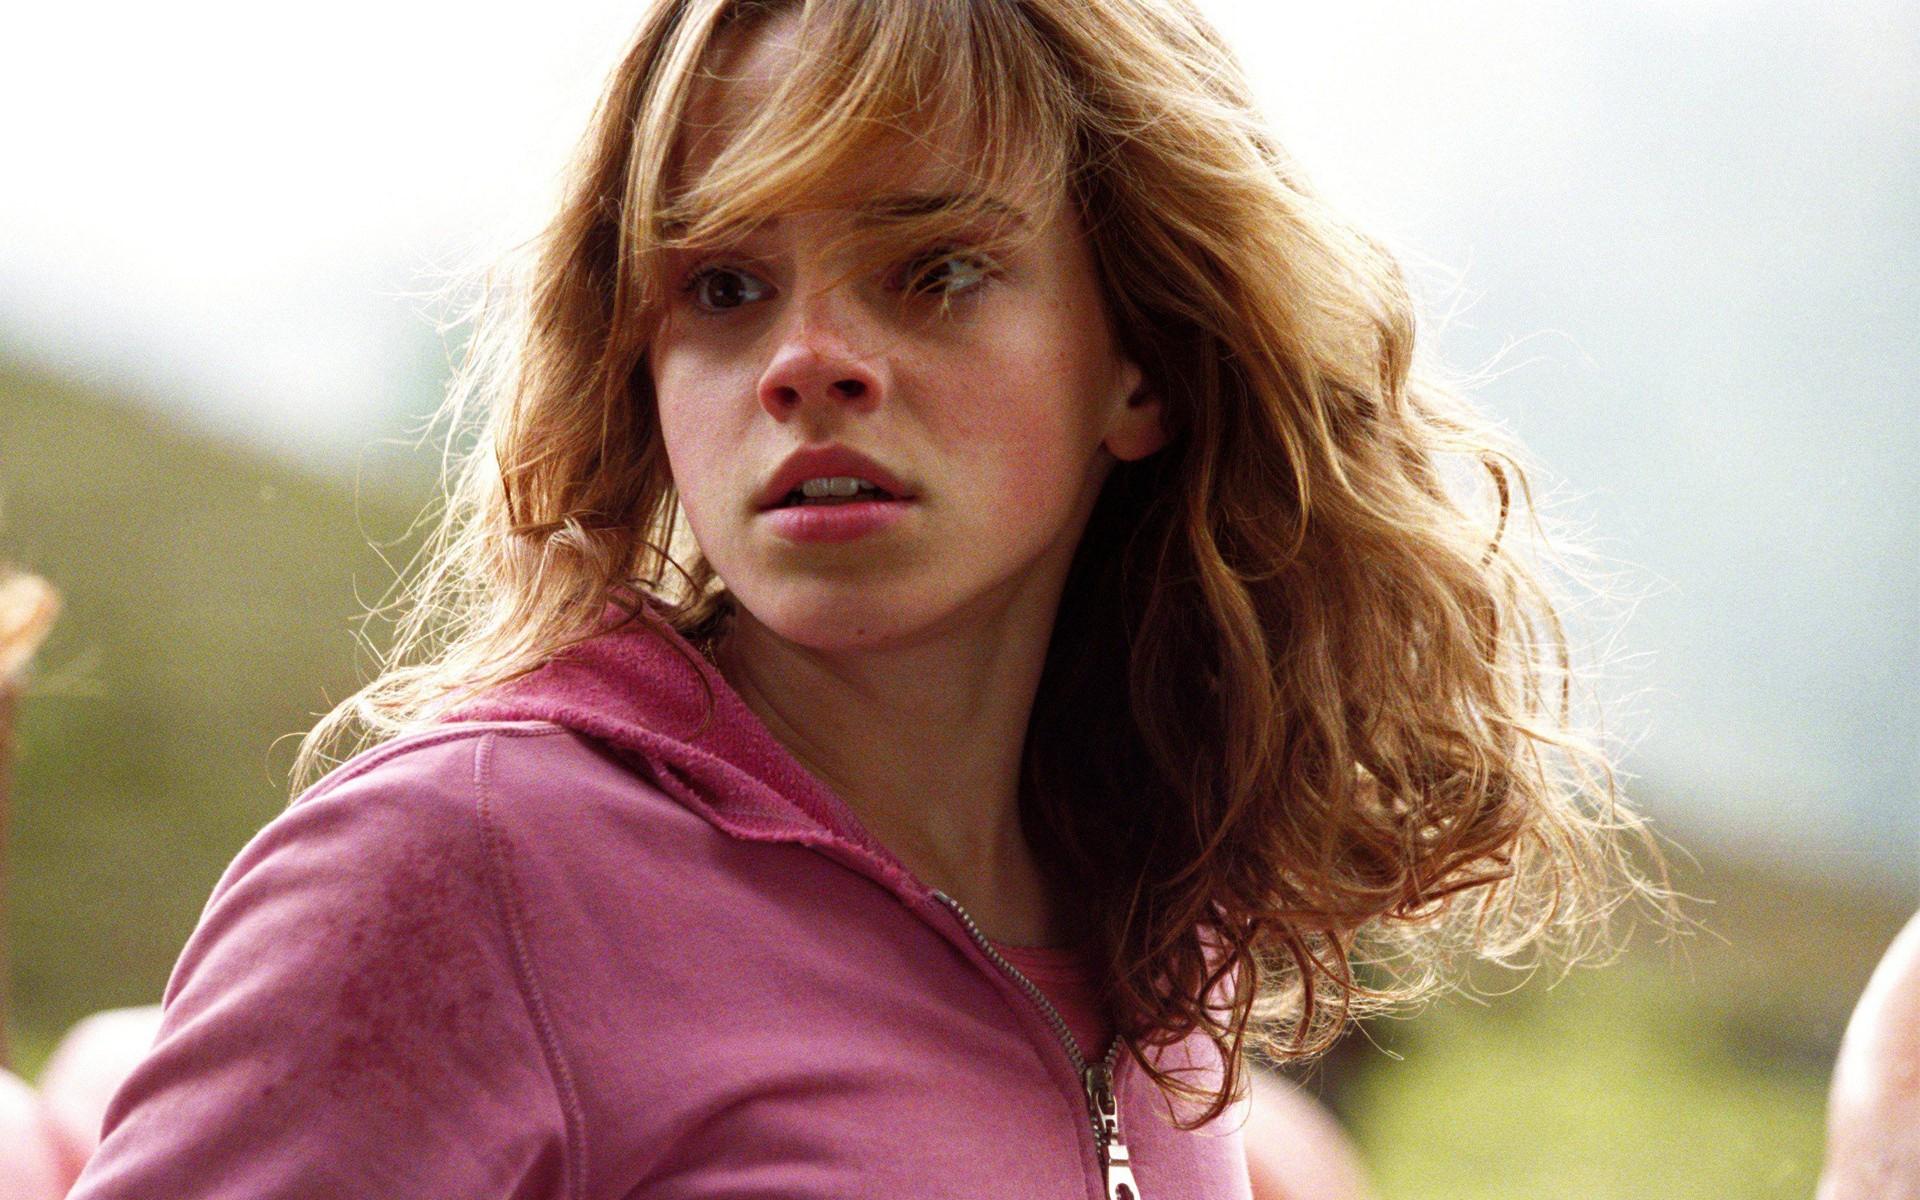 HD Wallpapers Emma Watson High Quality Wide